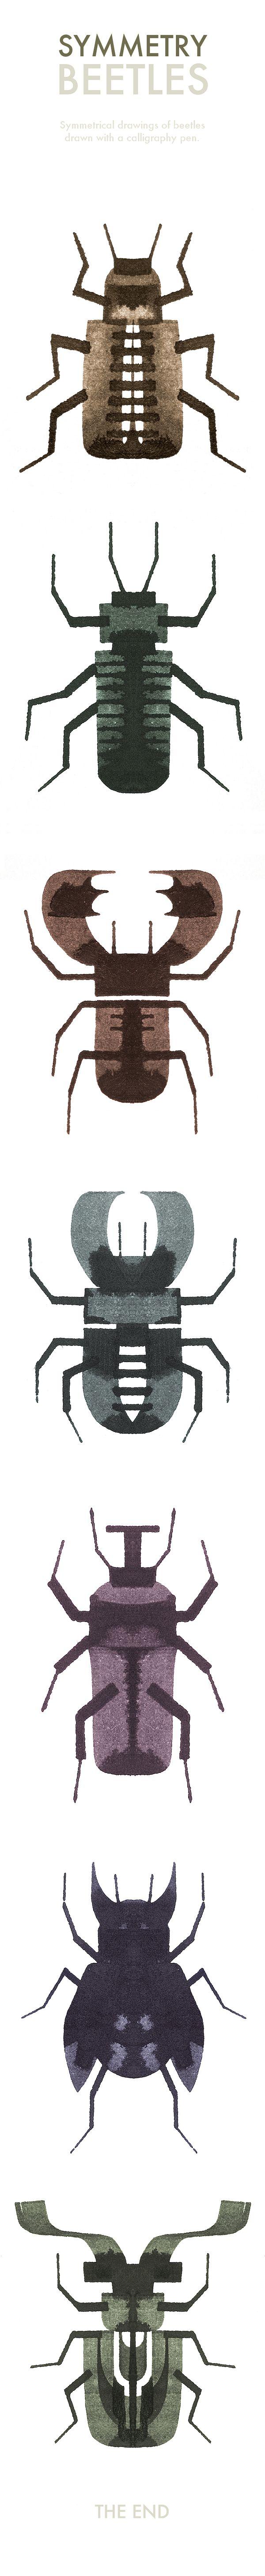 Symmetry Beetles on Behance